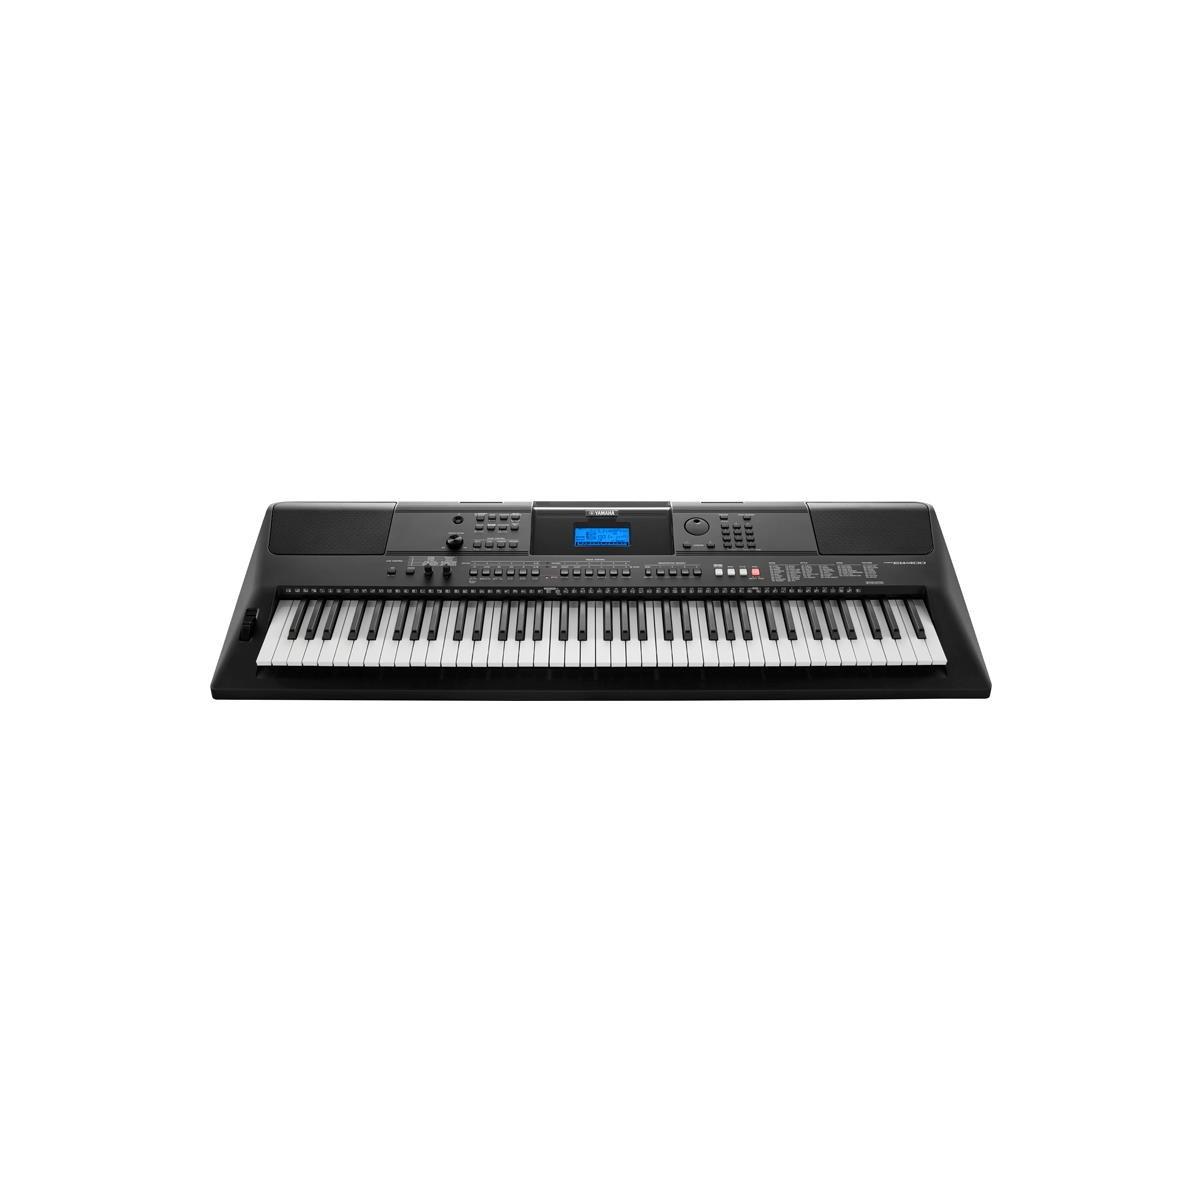 teclado yamaha psr ew400 klavier. Black Bedroom Furniture Sets. Home Design Ideas